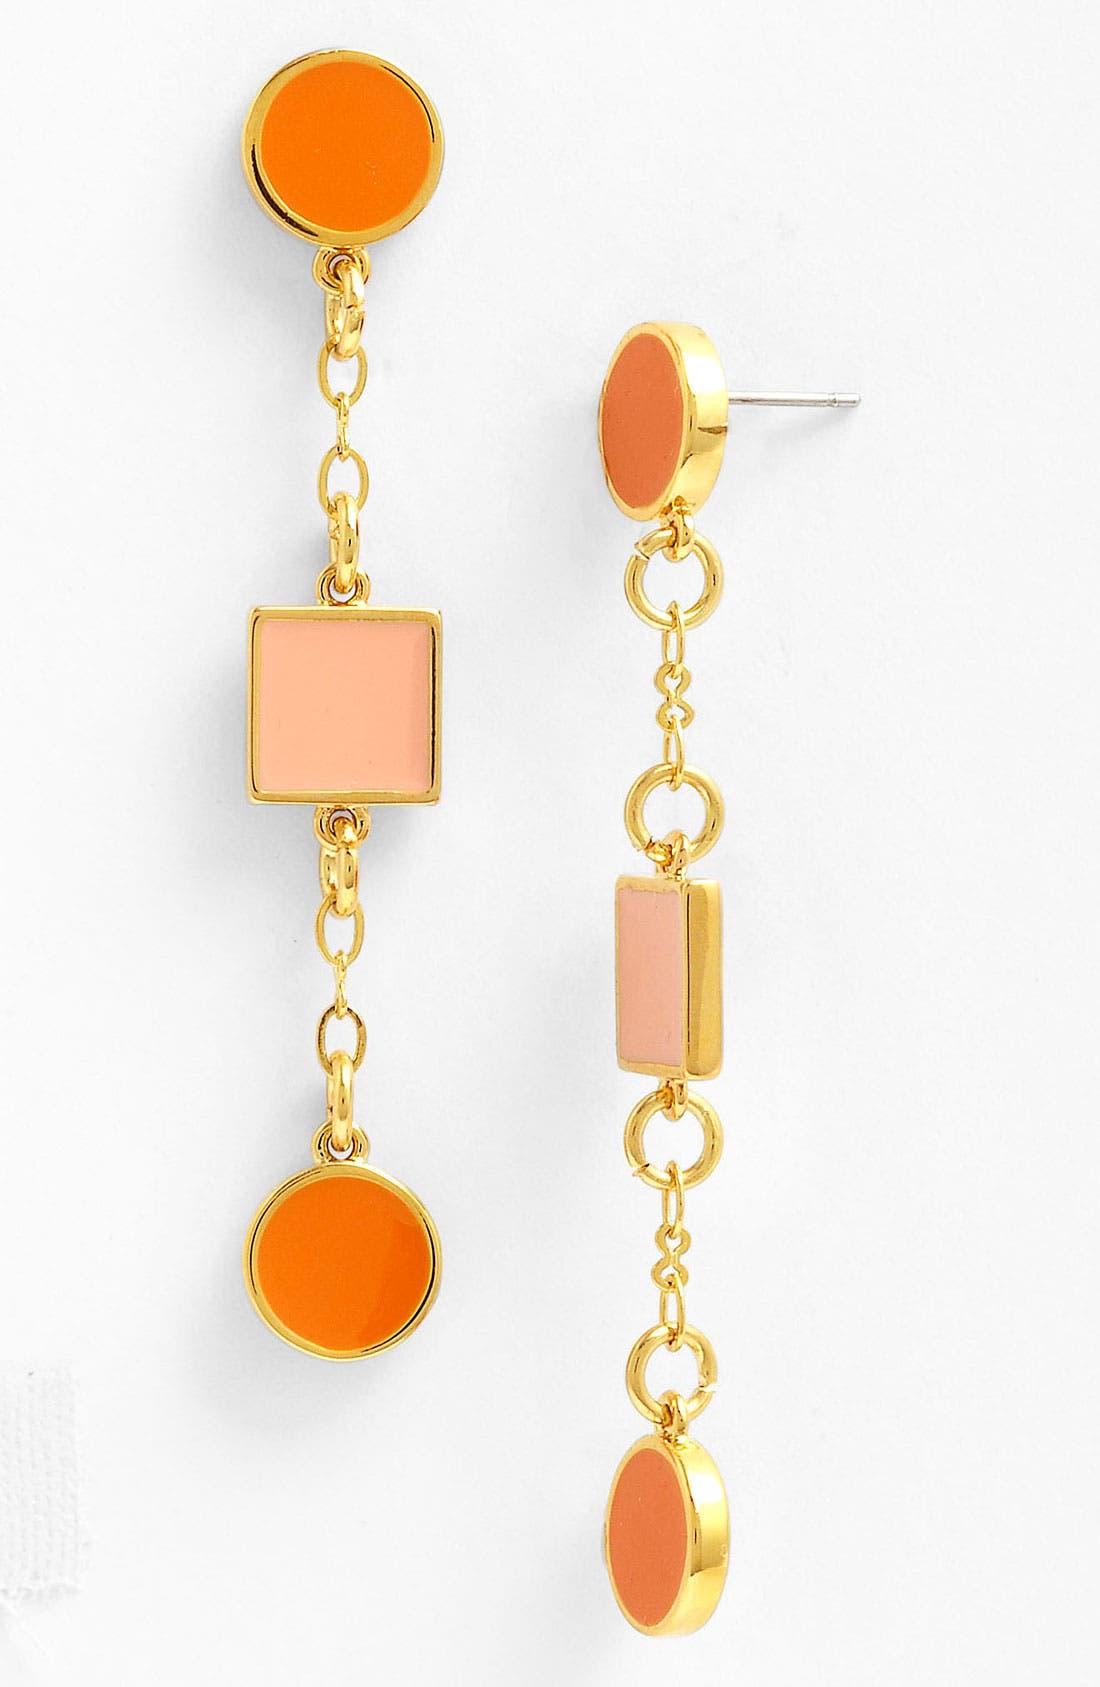 Main Image - Tory Burch 'Clemens' Linear Earrings